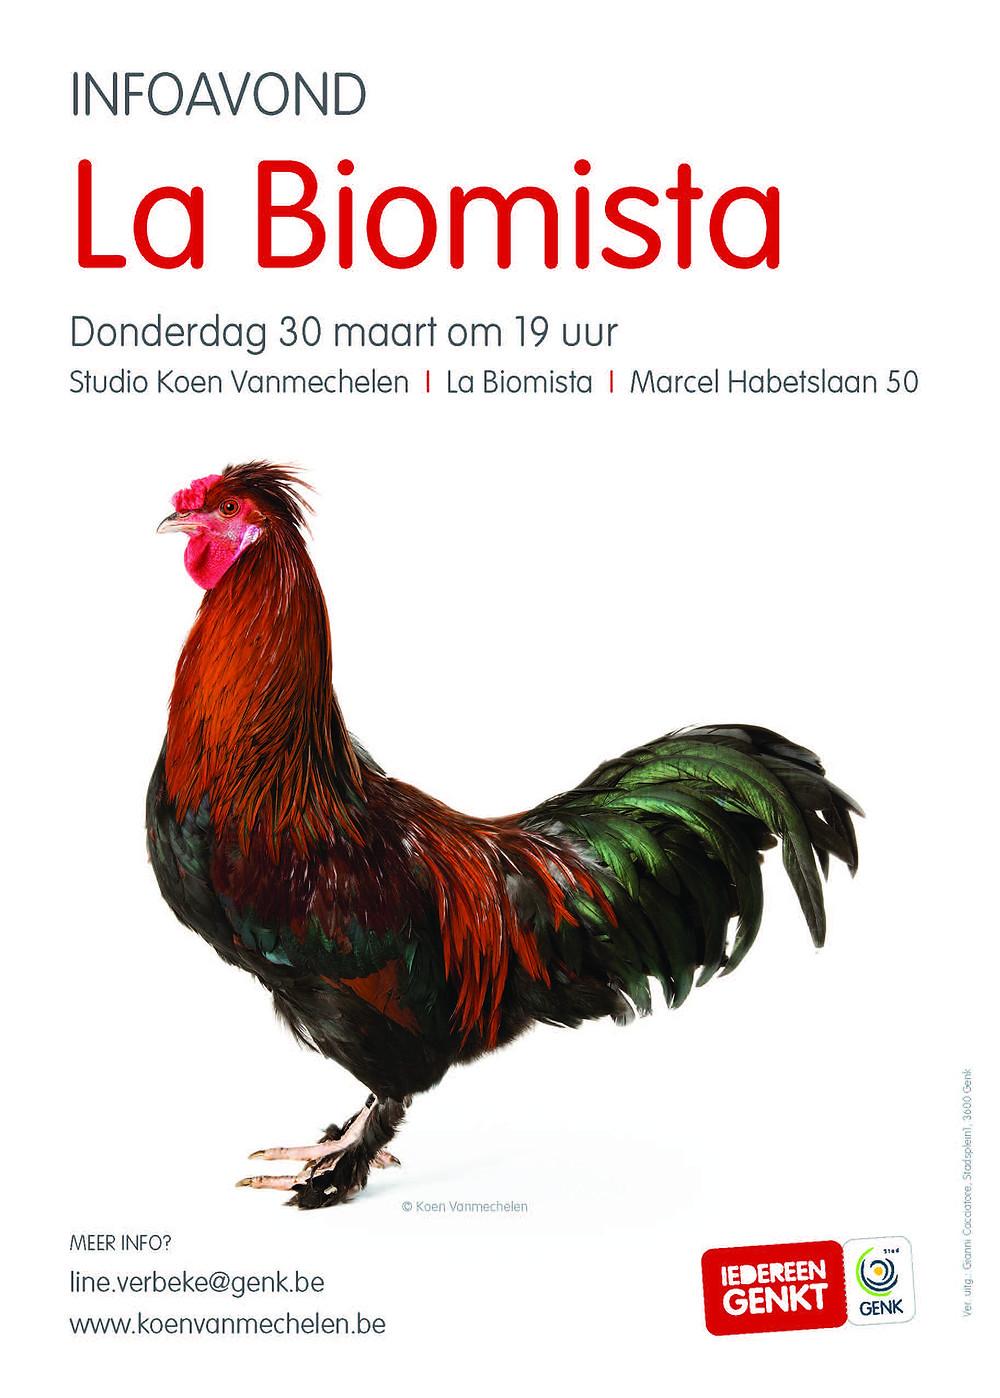 infoavond La Biomista